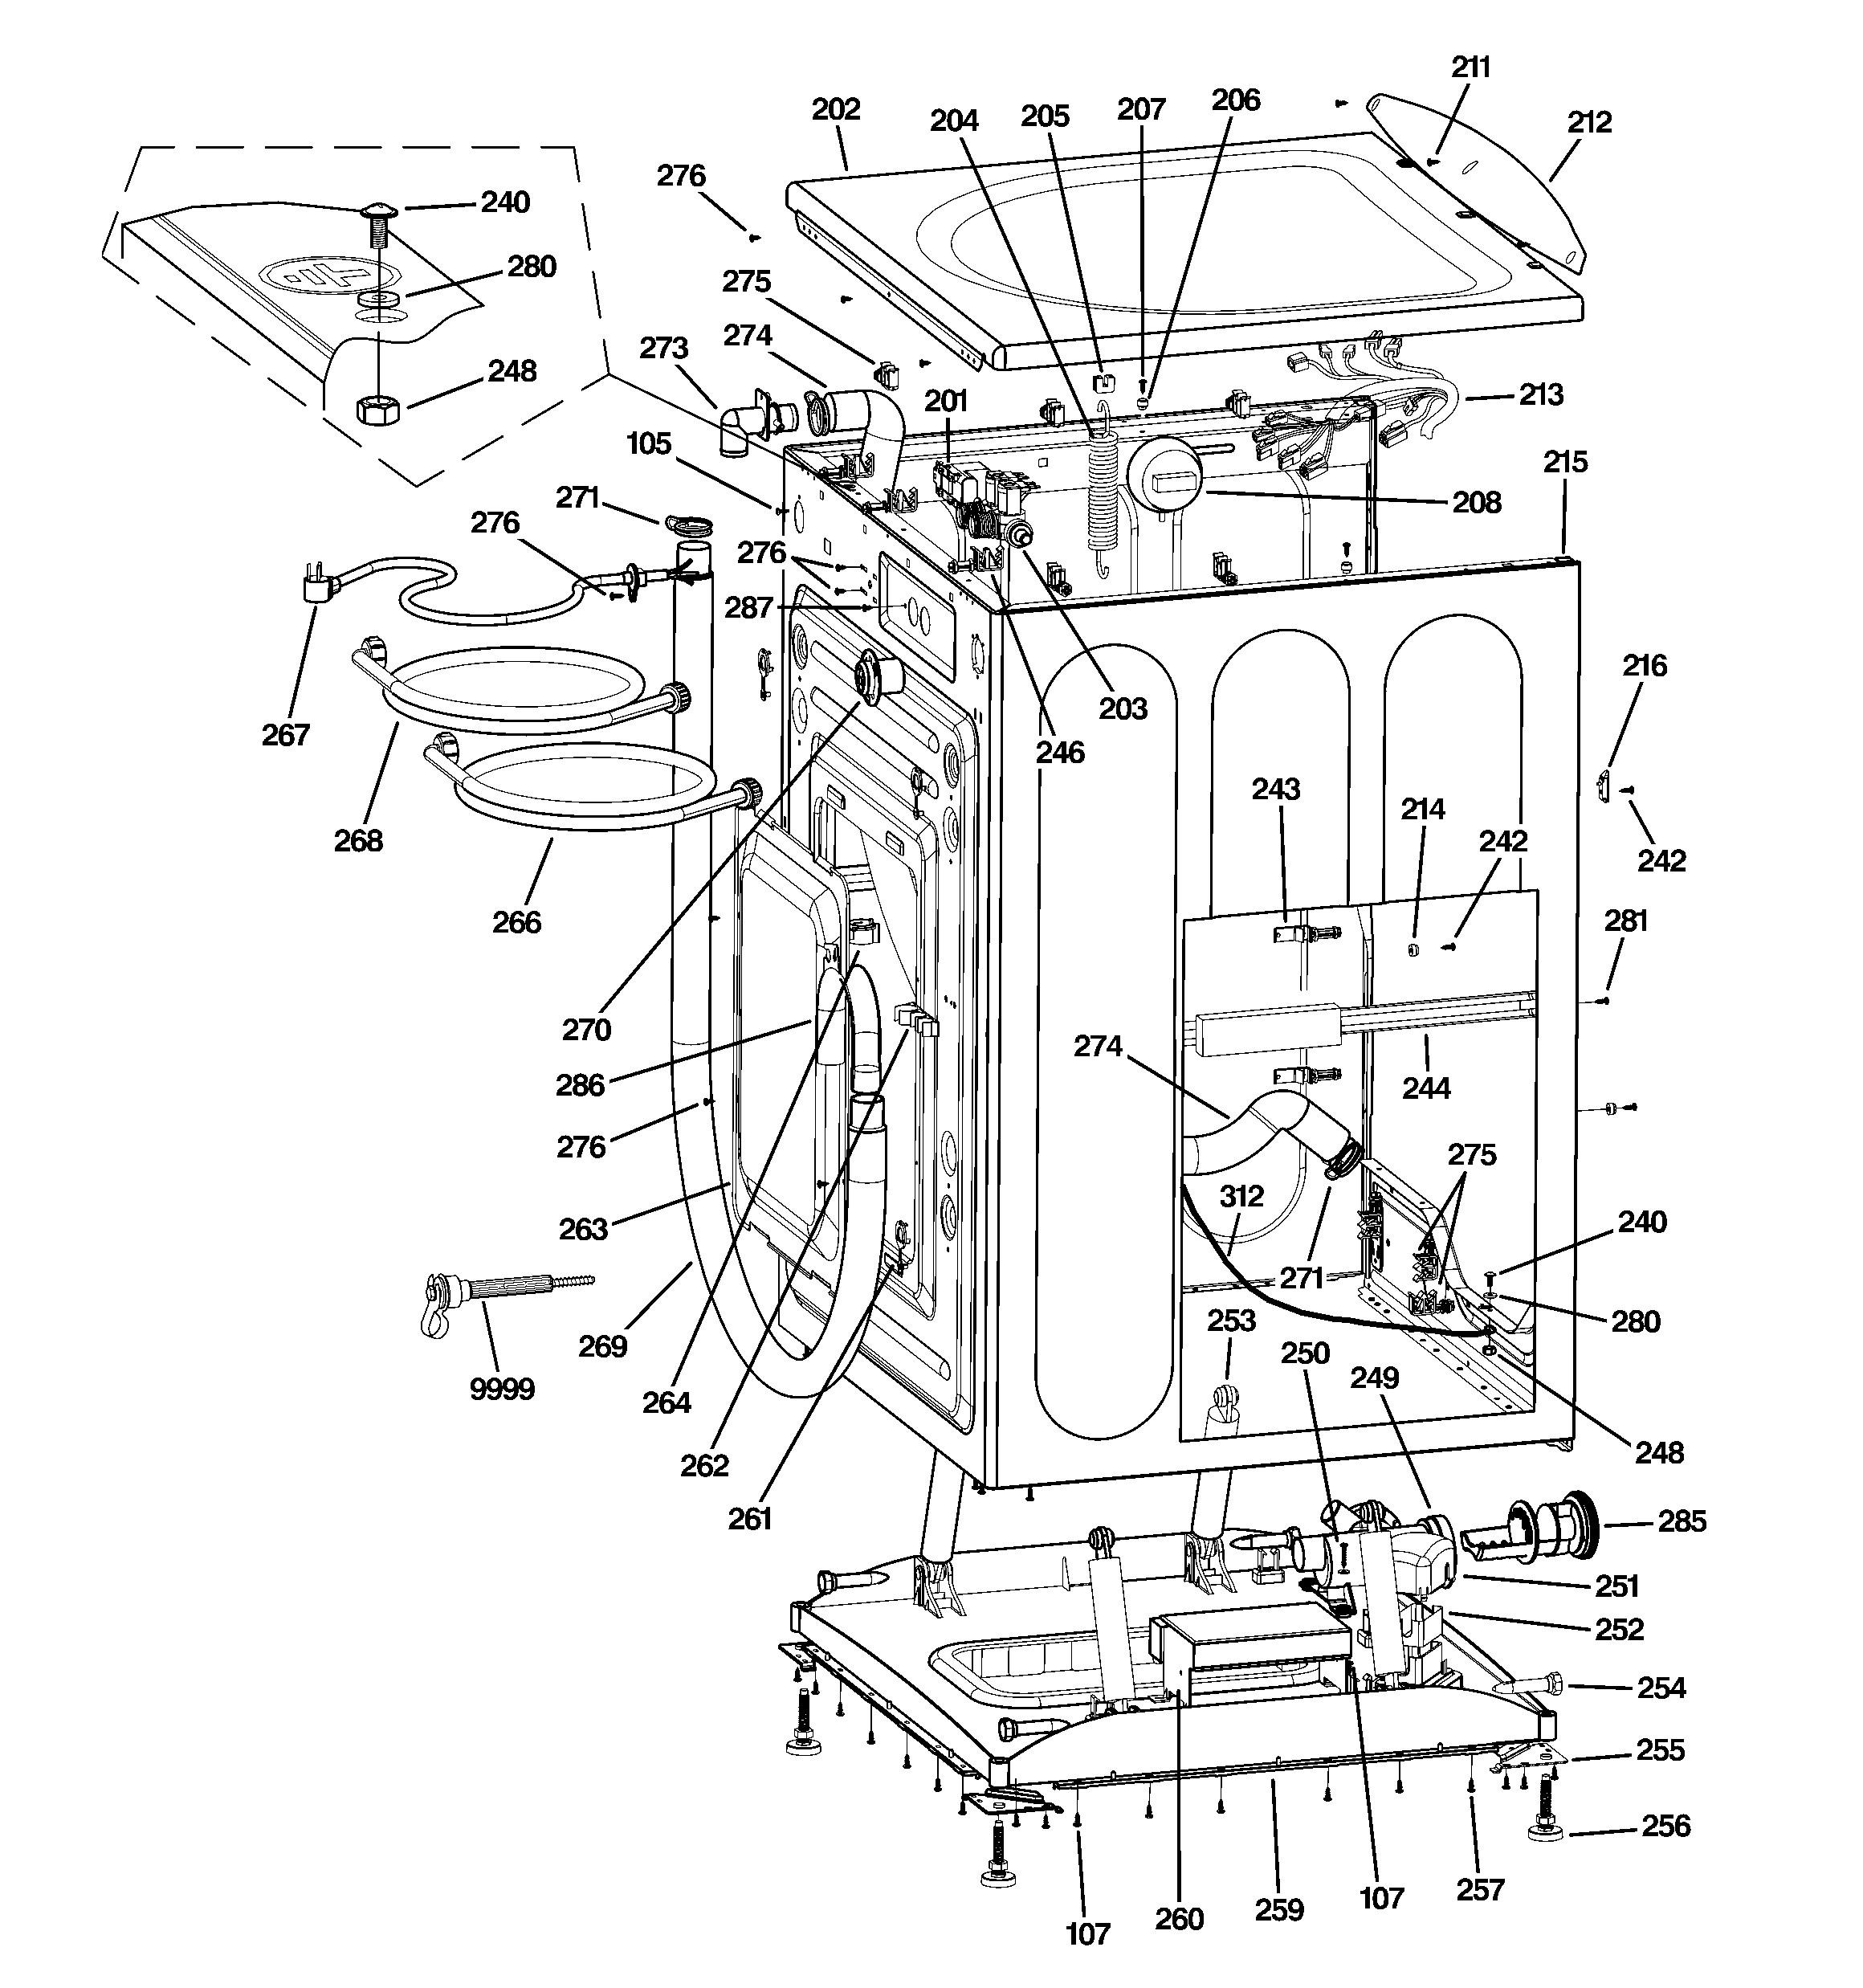 Ge Dishwasher Parts Diagram Ge Model Gfwn1100l2ww Residential Washers Genuine Parts Of Ge Dishwasher Parts Diagram